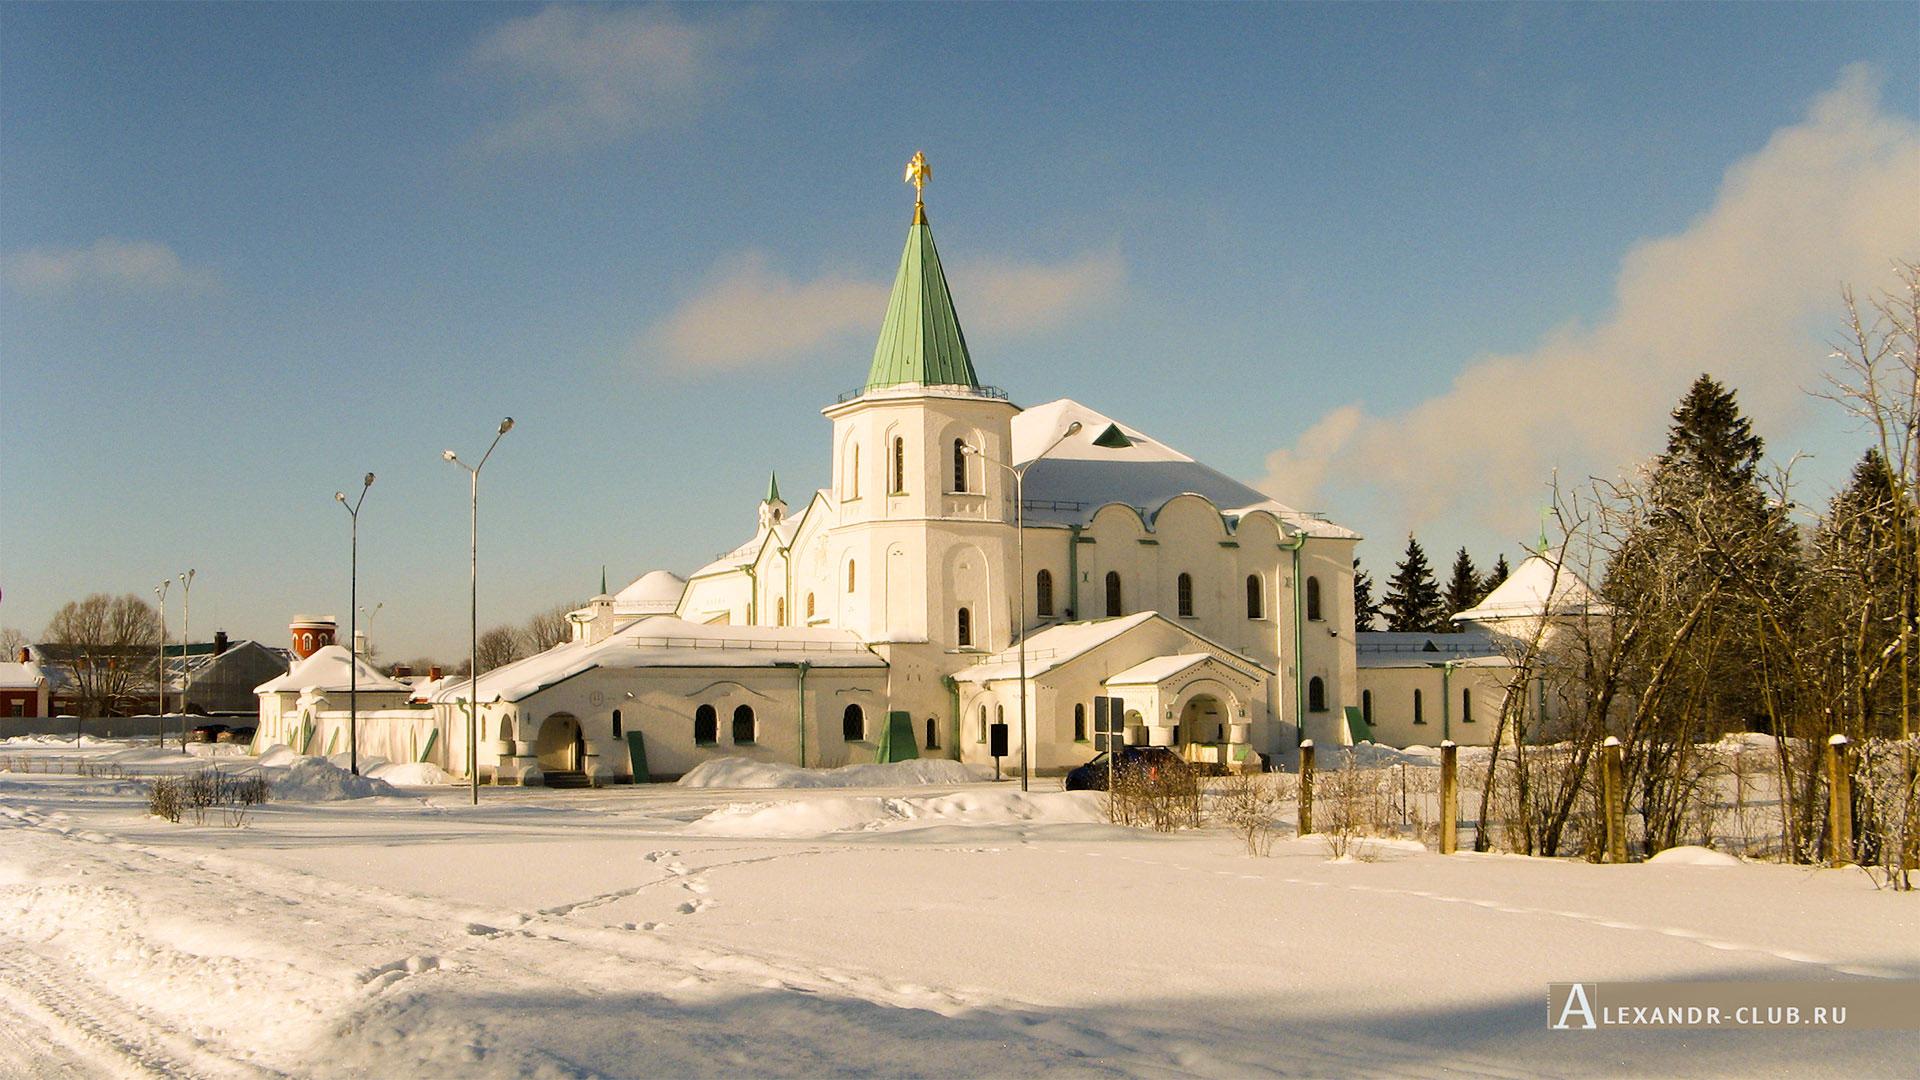 Пушкин, Царское Село, зима, Александровский парк, Ратная палата